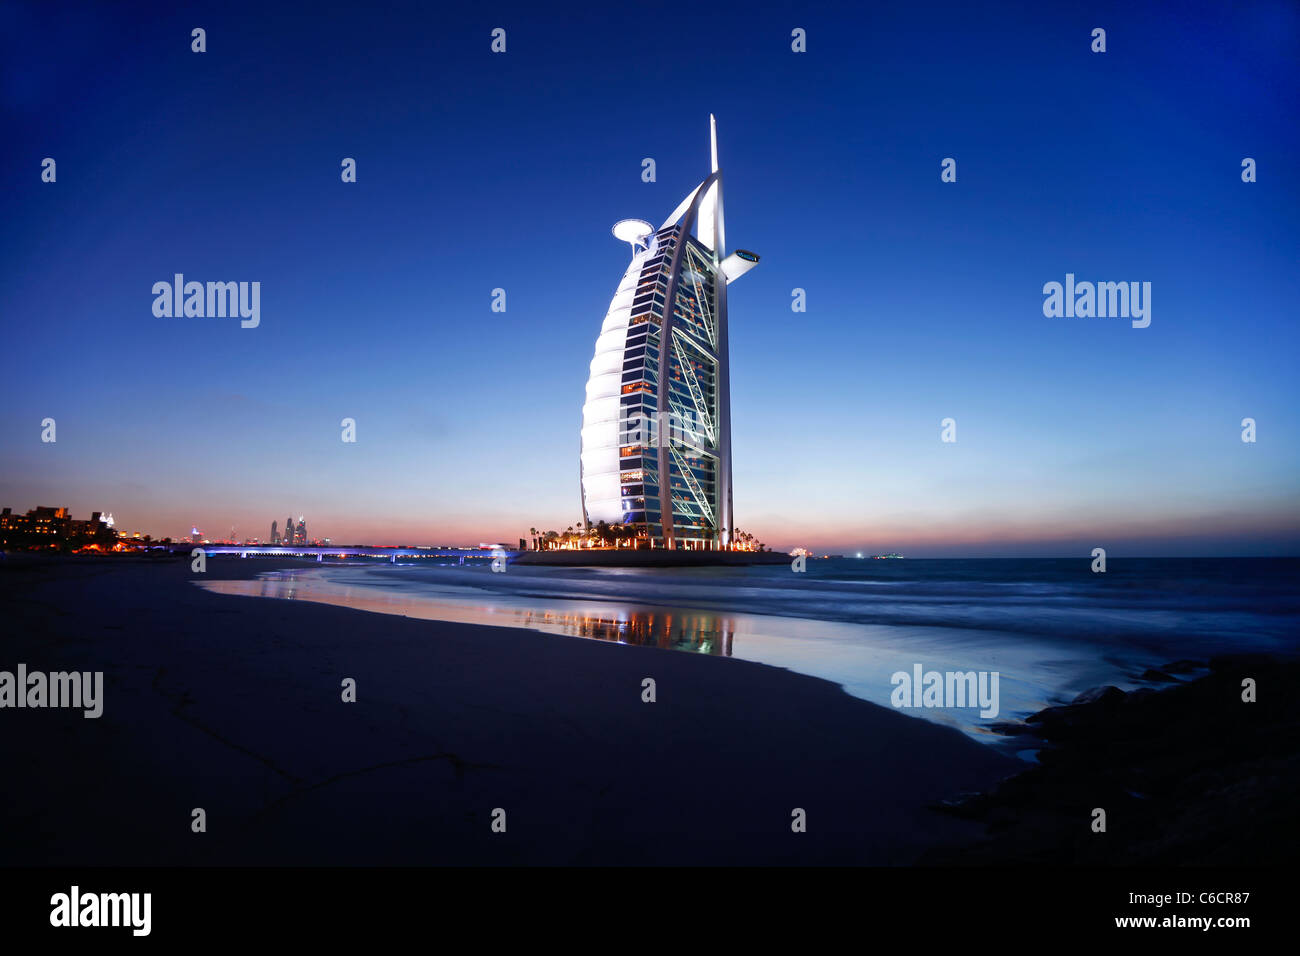 Burj Al Arab Hotel, Dubai, Emirati Arabi Uniti Immagini Stock